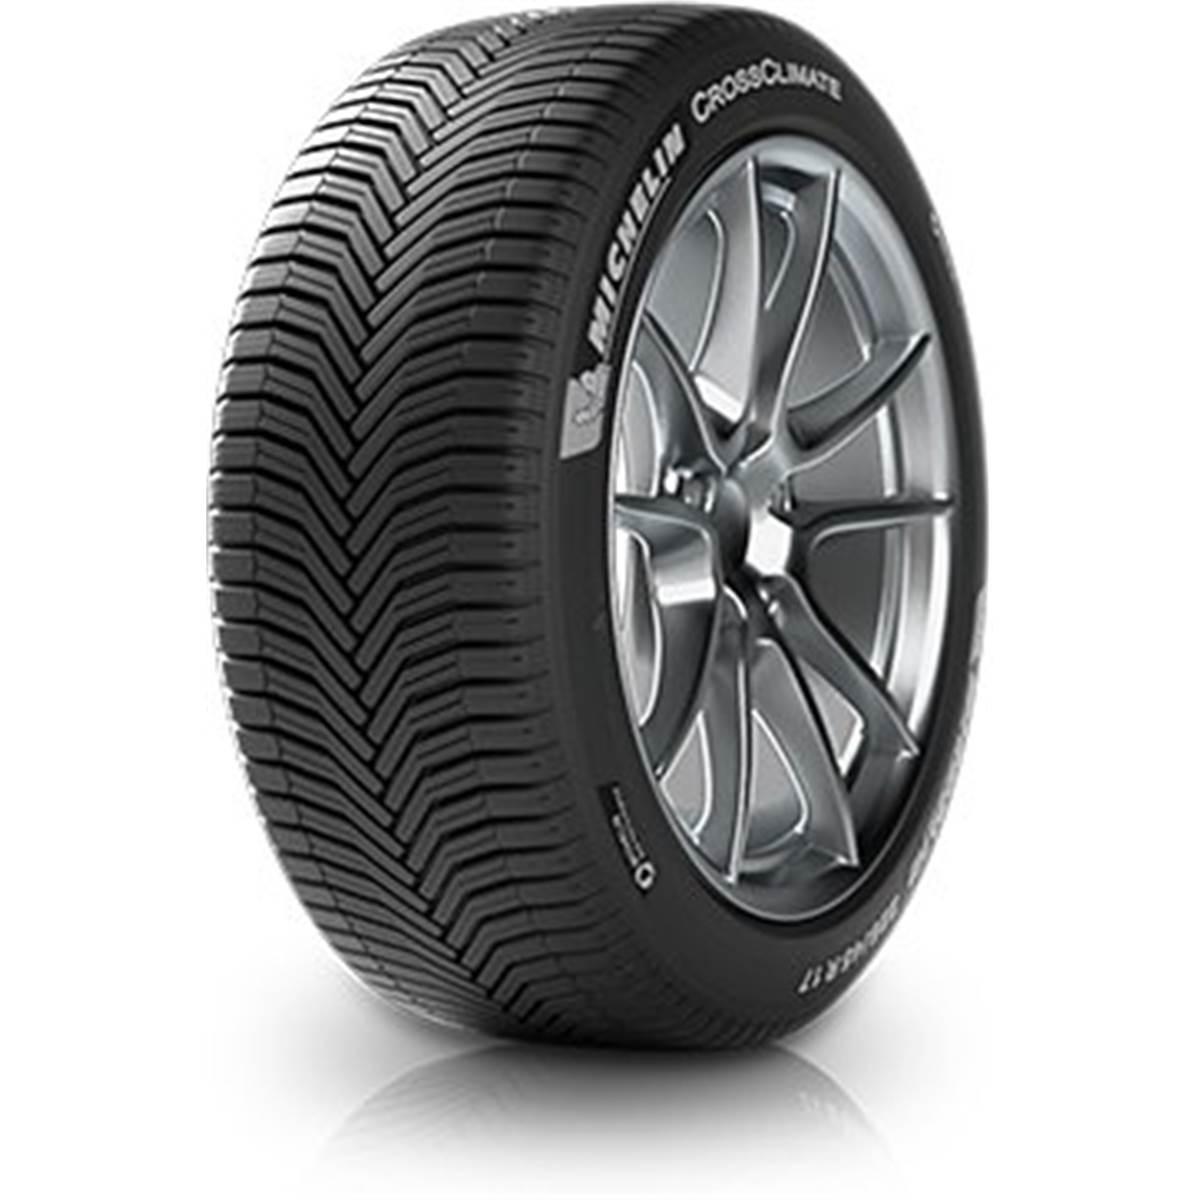 Pneu 4 Saisons Michelin 195/60R15 92V Cross Climate XL